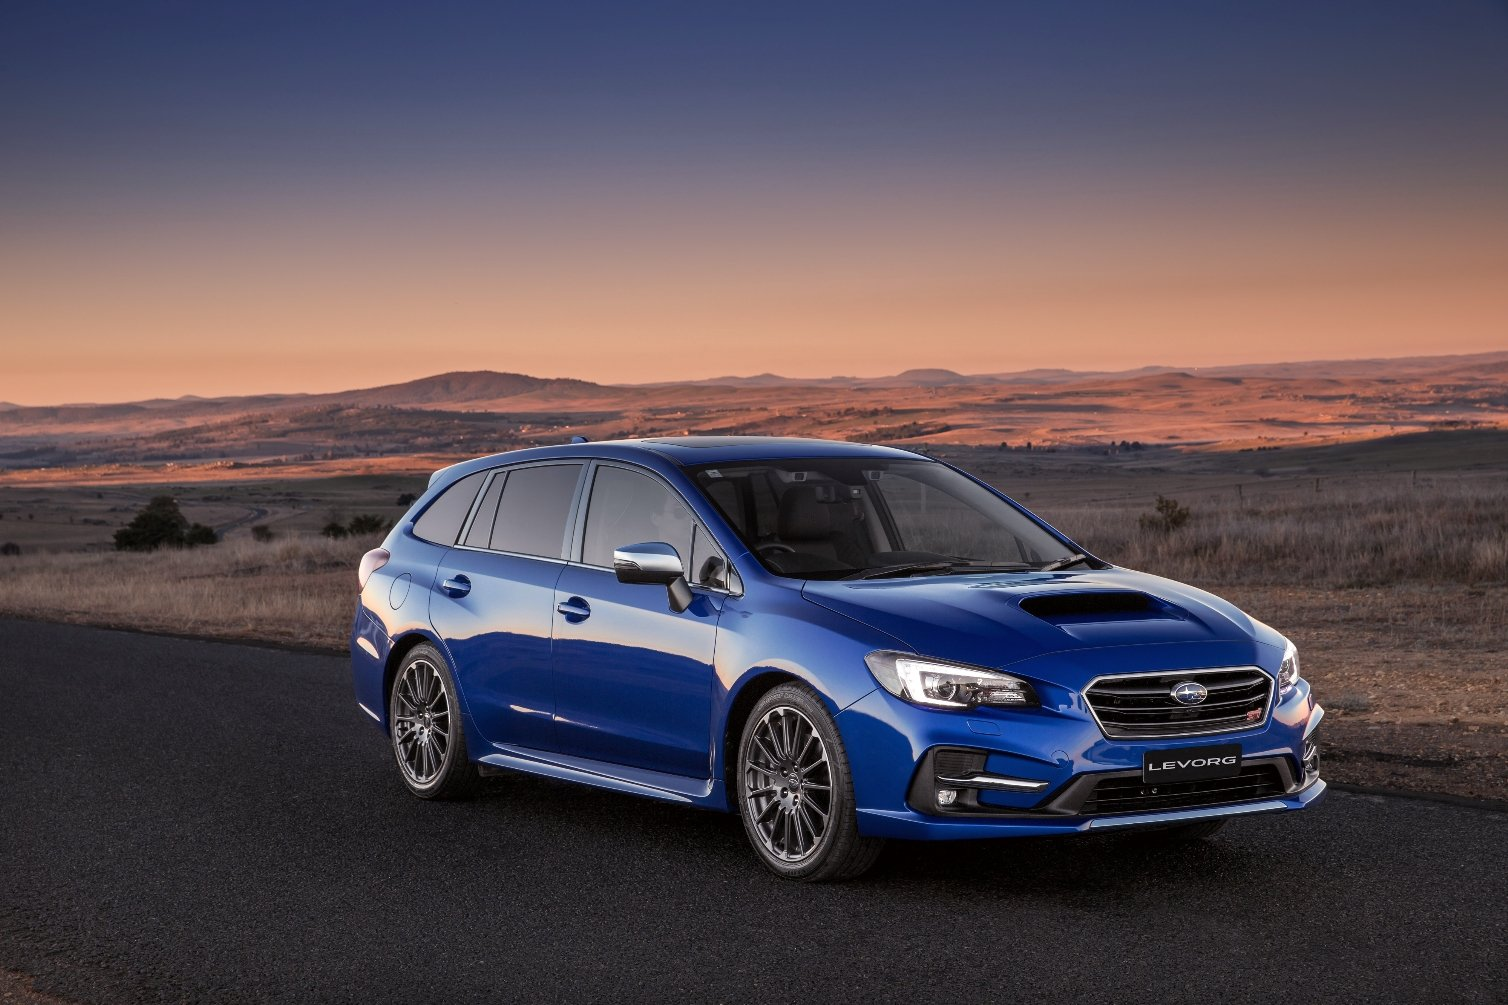 Levorg Boosted For 2018 Blue Sti With White Rims Subaru